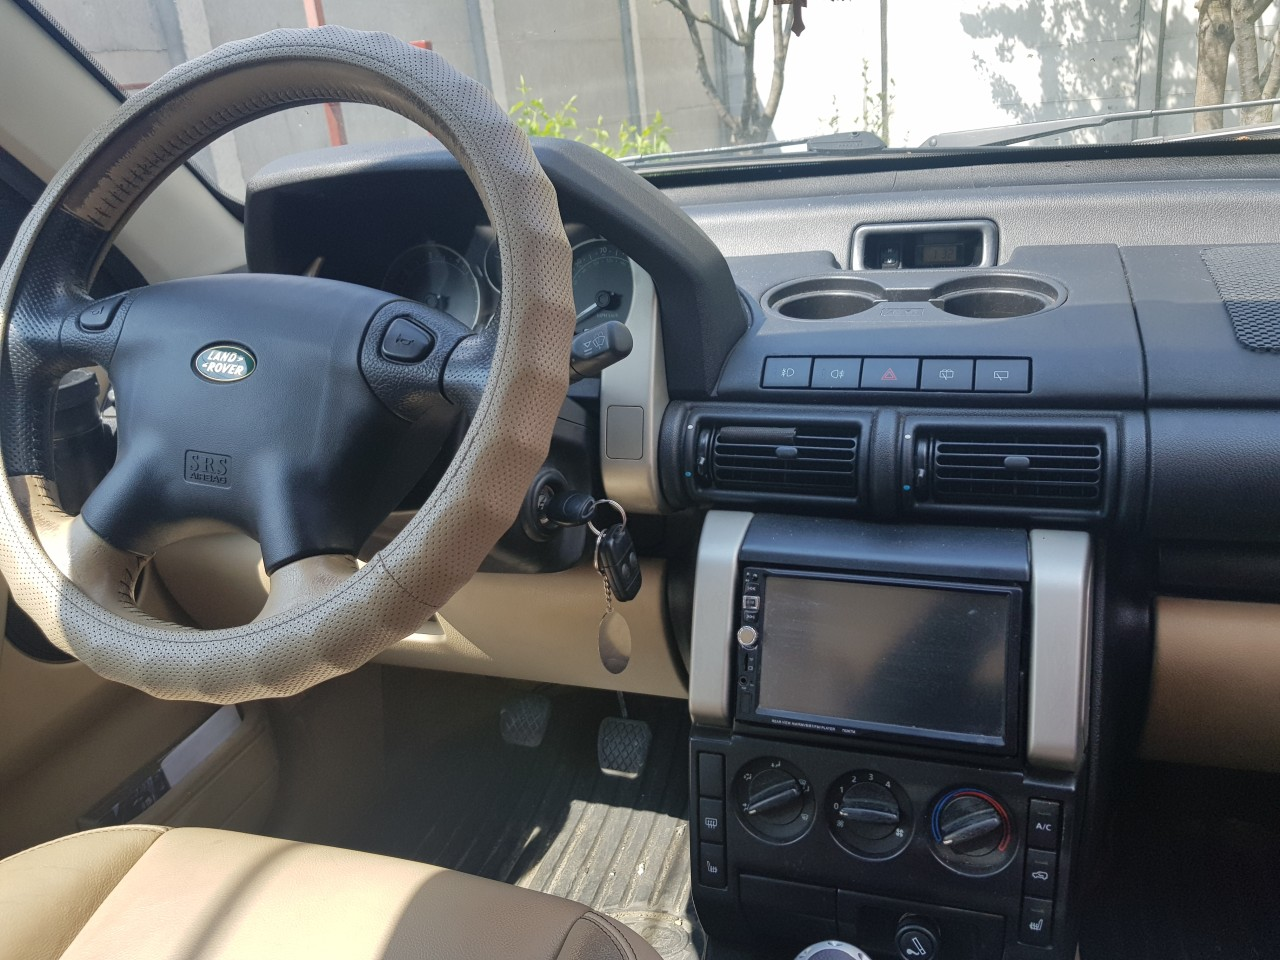 Land-Rover Freelander 2.0 TD4 2006